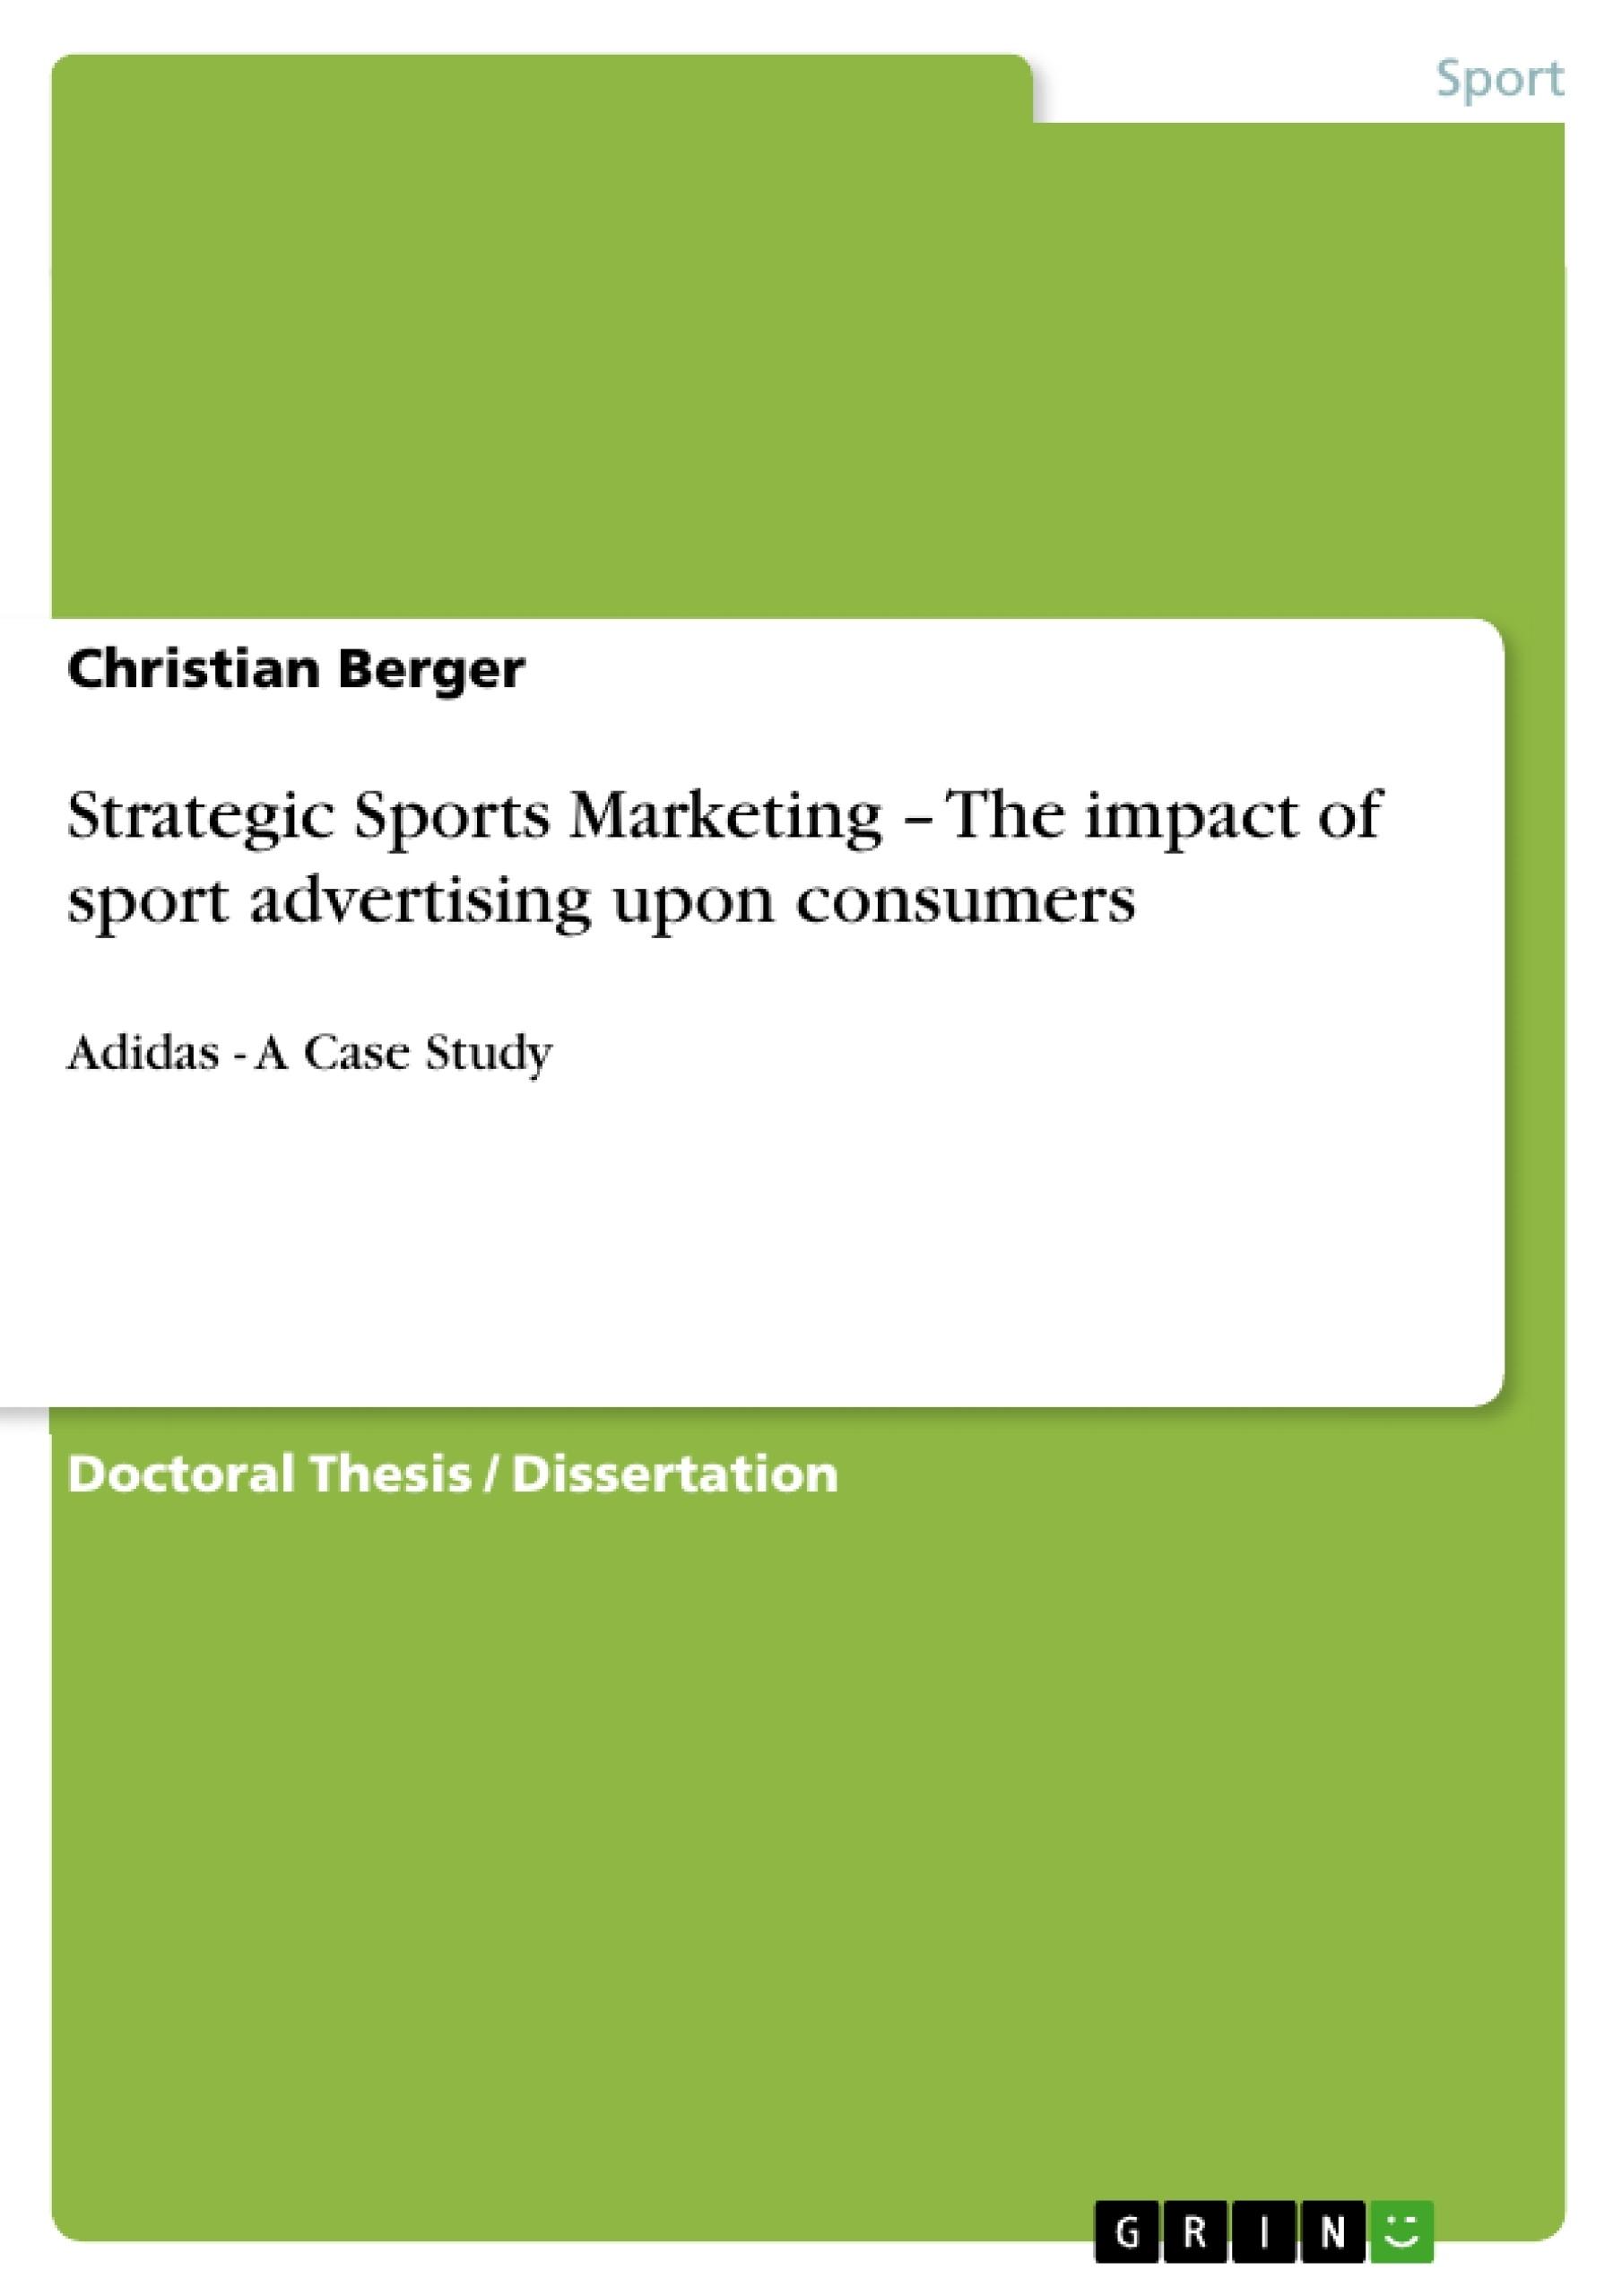 sports marketing dissertation